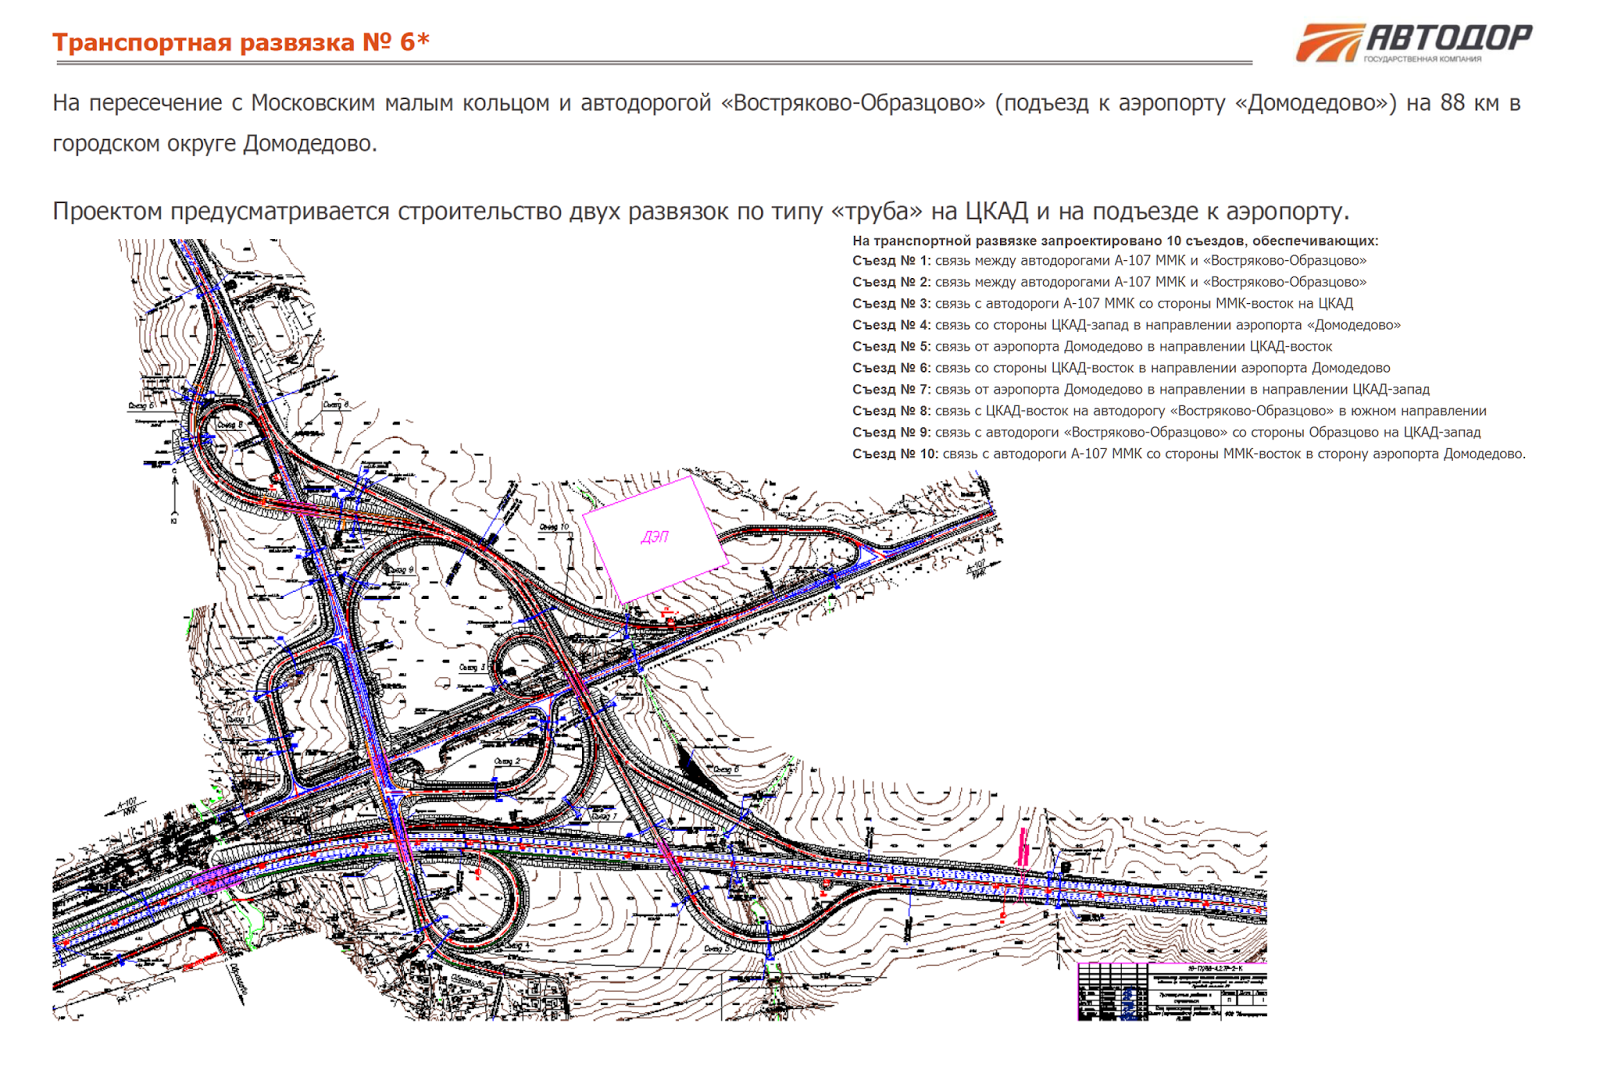 Схема цкад 2013 раменский район фото 929